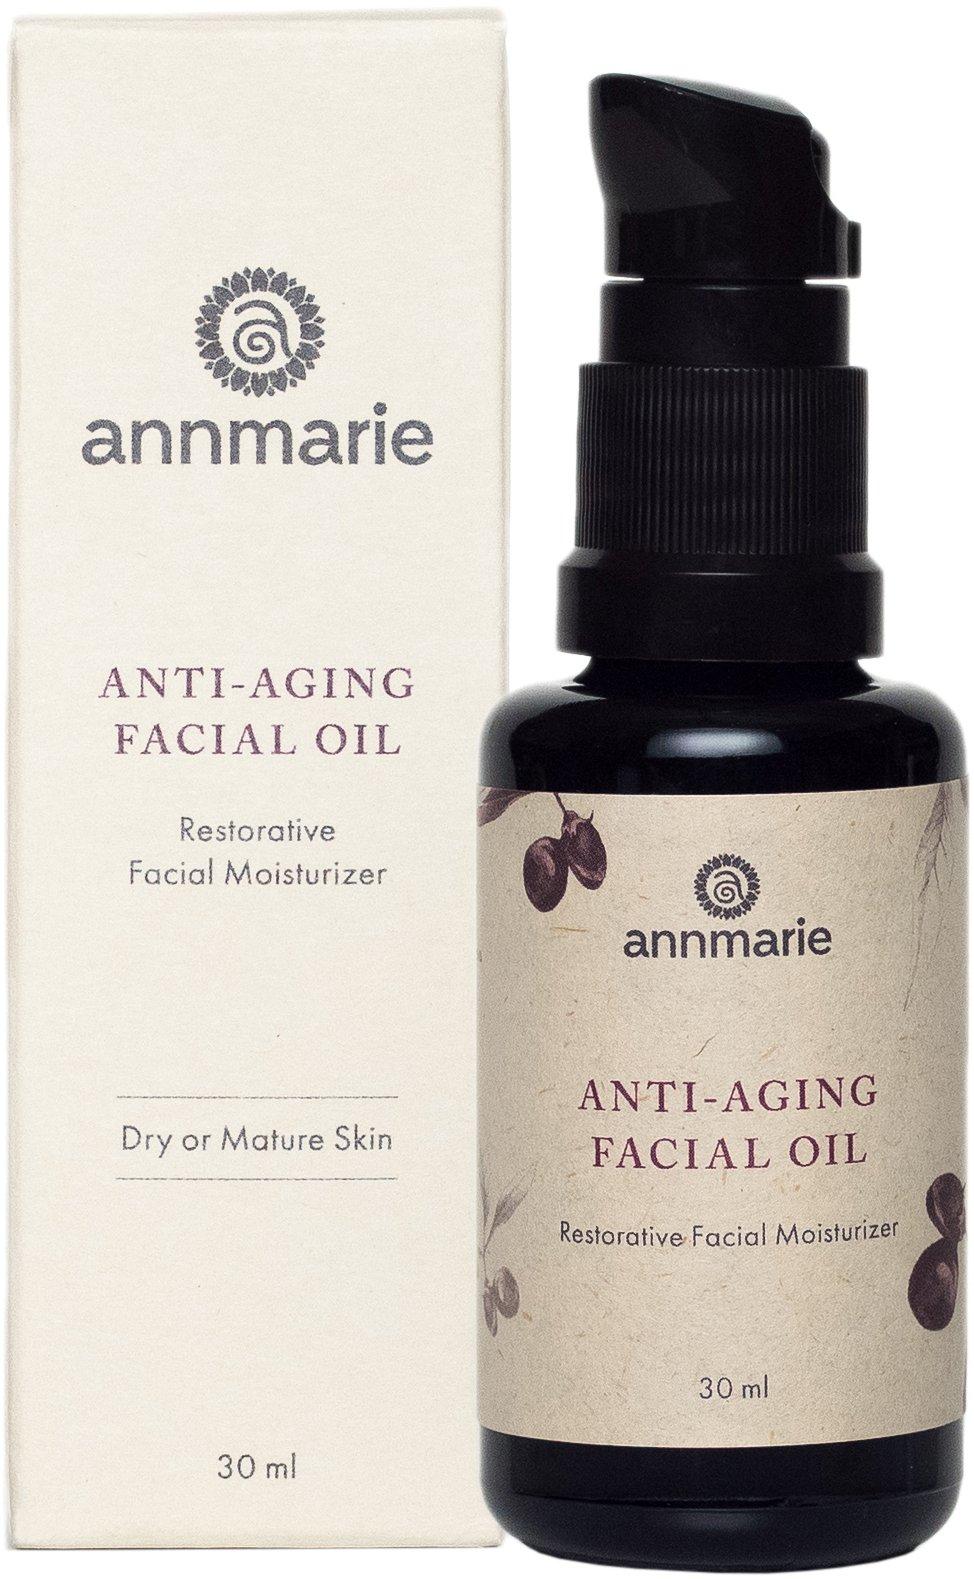 Annmarie Skin Care Anti-Aging Facial Oil - Moisturizing Face Oil For Dry or Mature Skin with Jojoba Oil, Goji Berries + Chia Seed Oil (30ml / 1 oz)